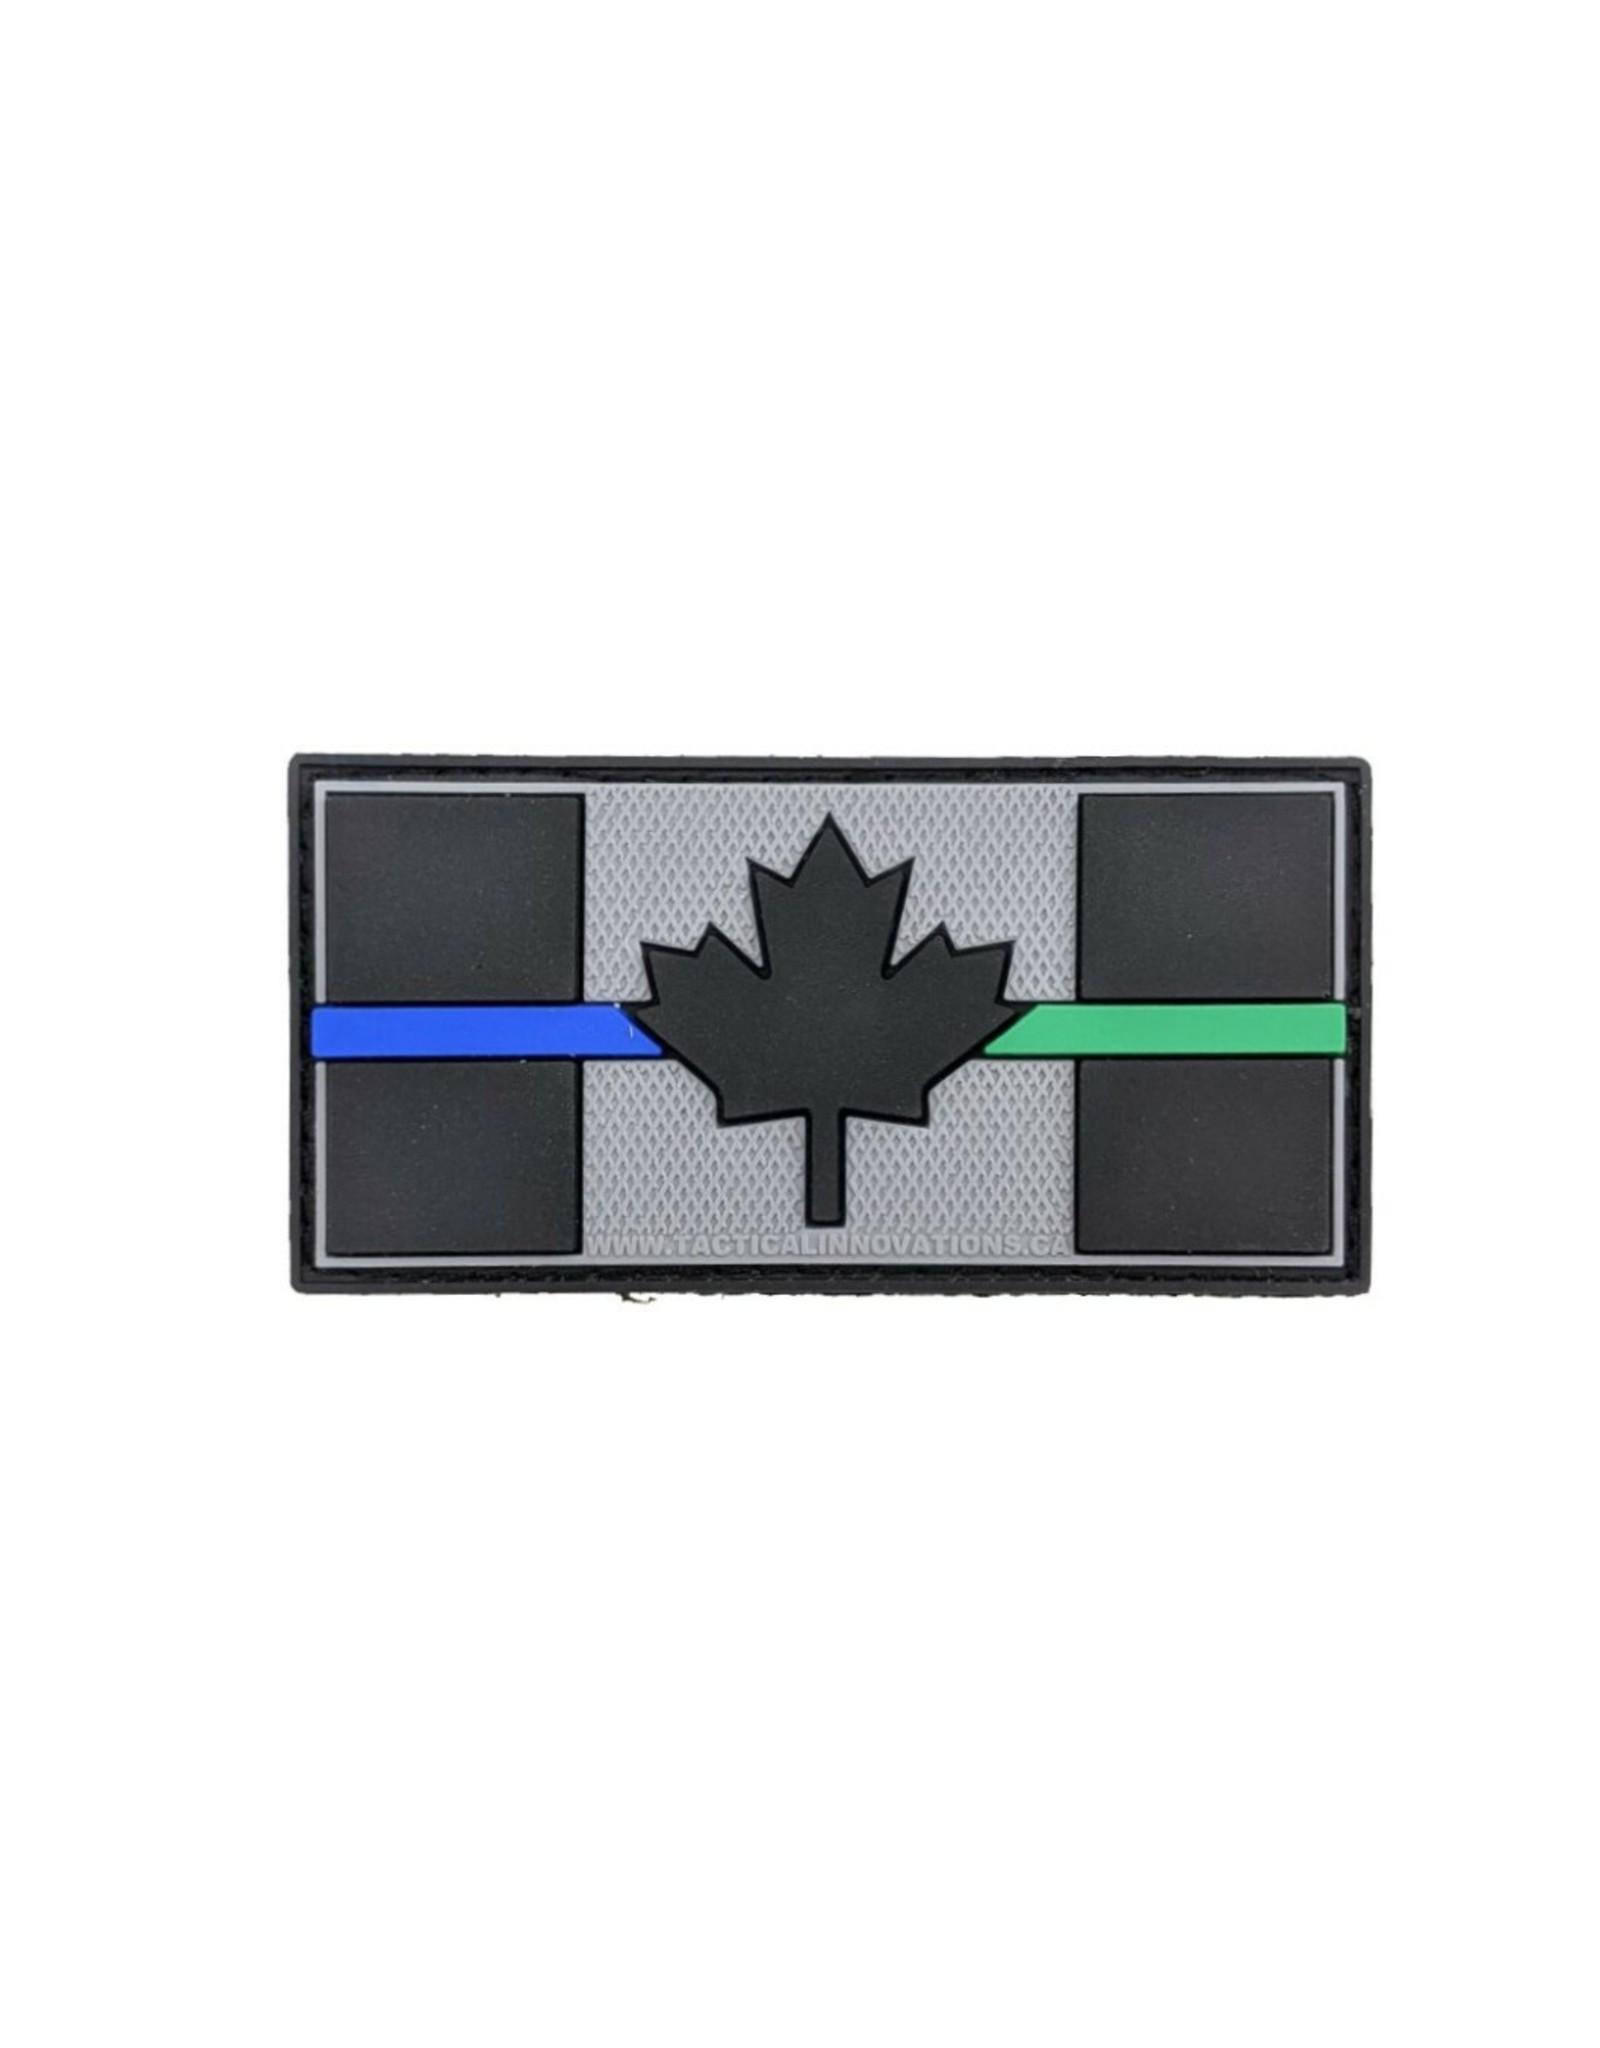 TIC Patch - THIN BLUE/GREEN LINE FLAG 1X2